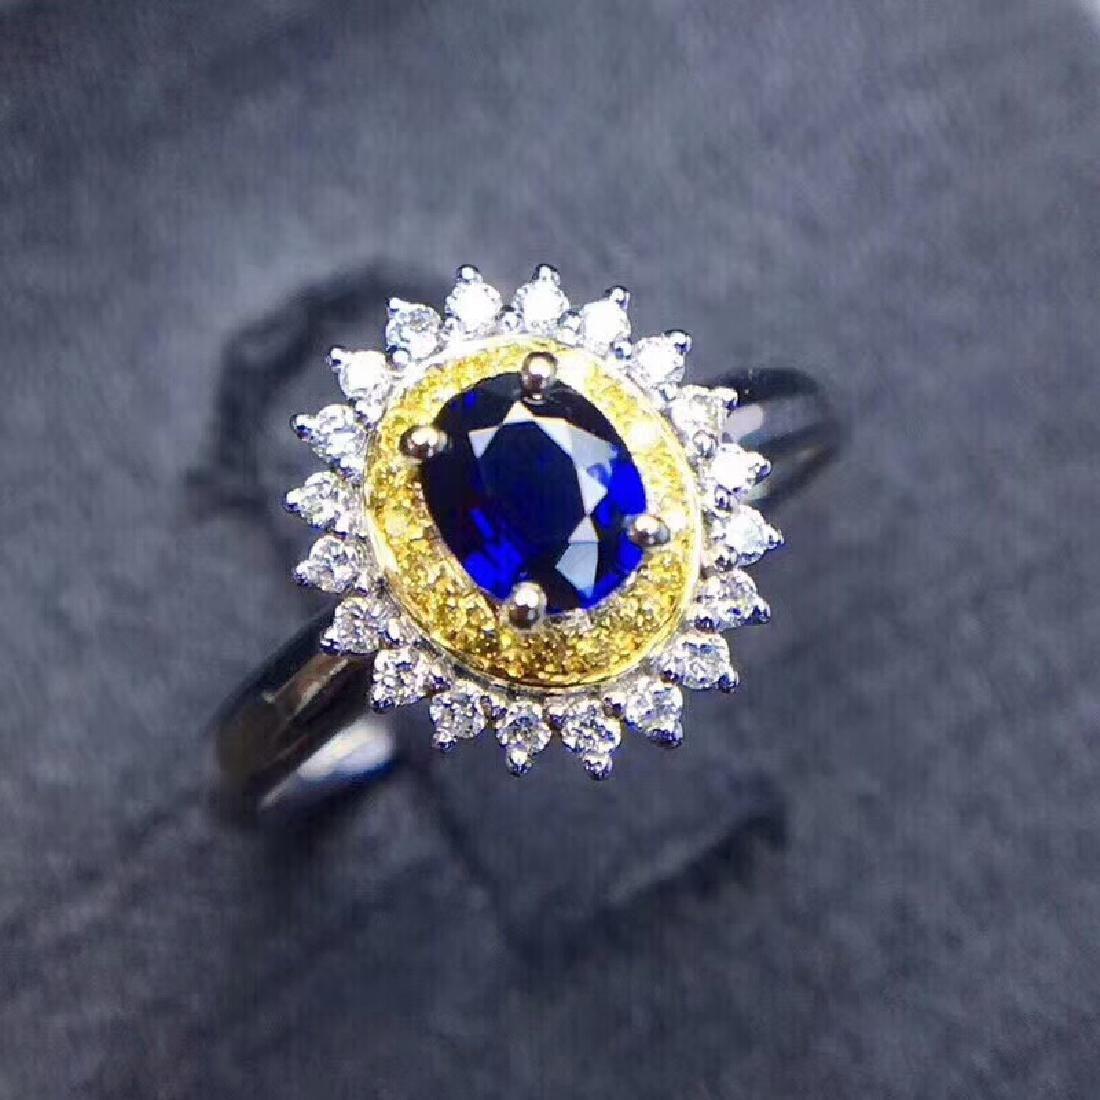 0.75 CTW Sapphire & VS Diamond Ring 18K - 8